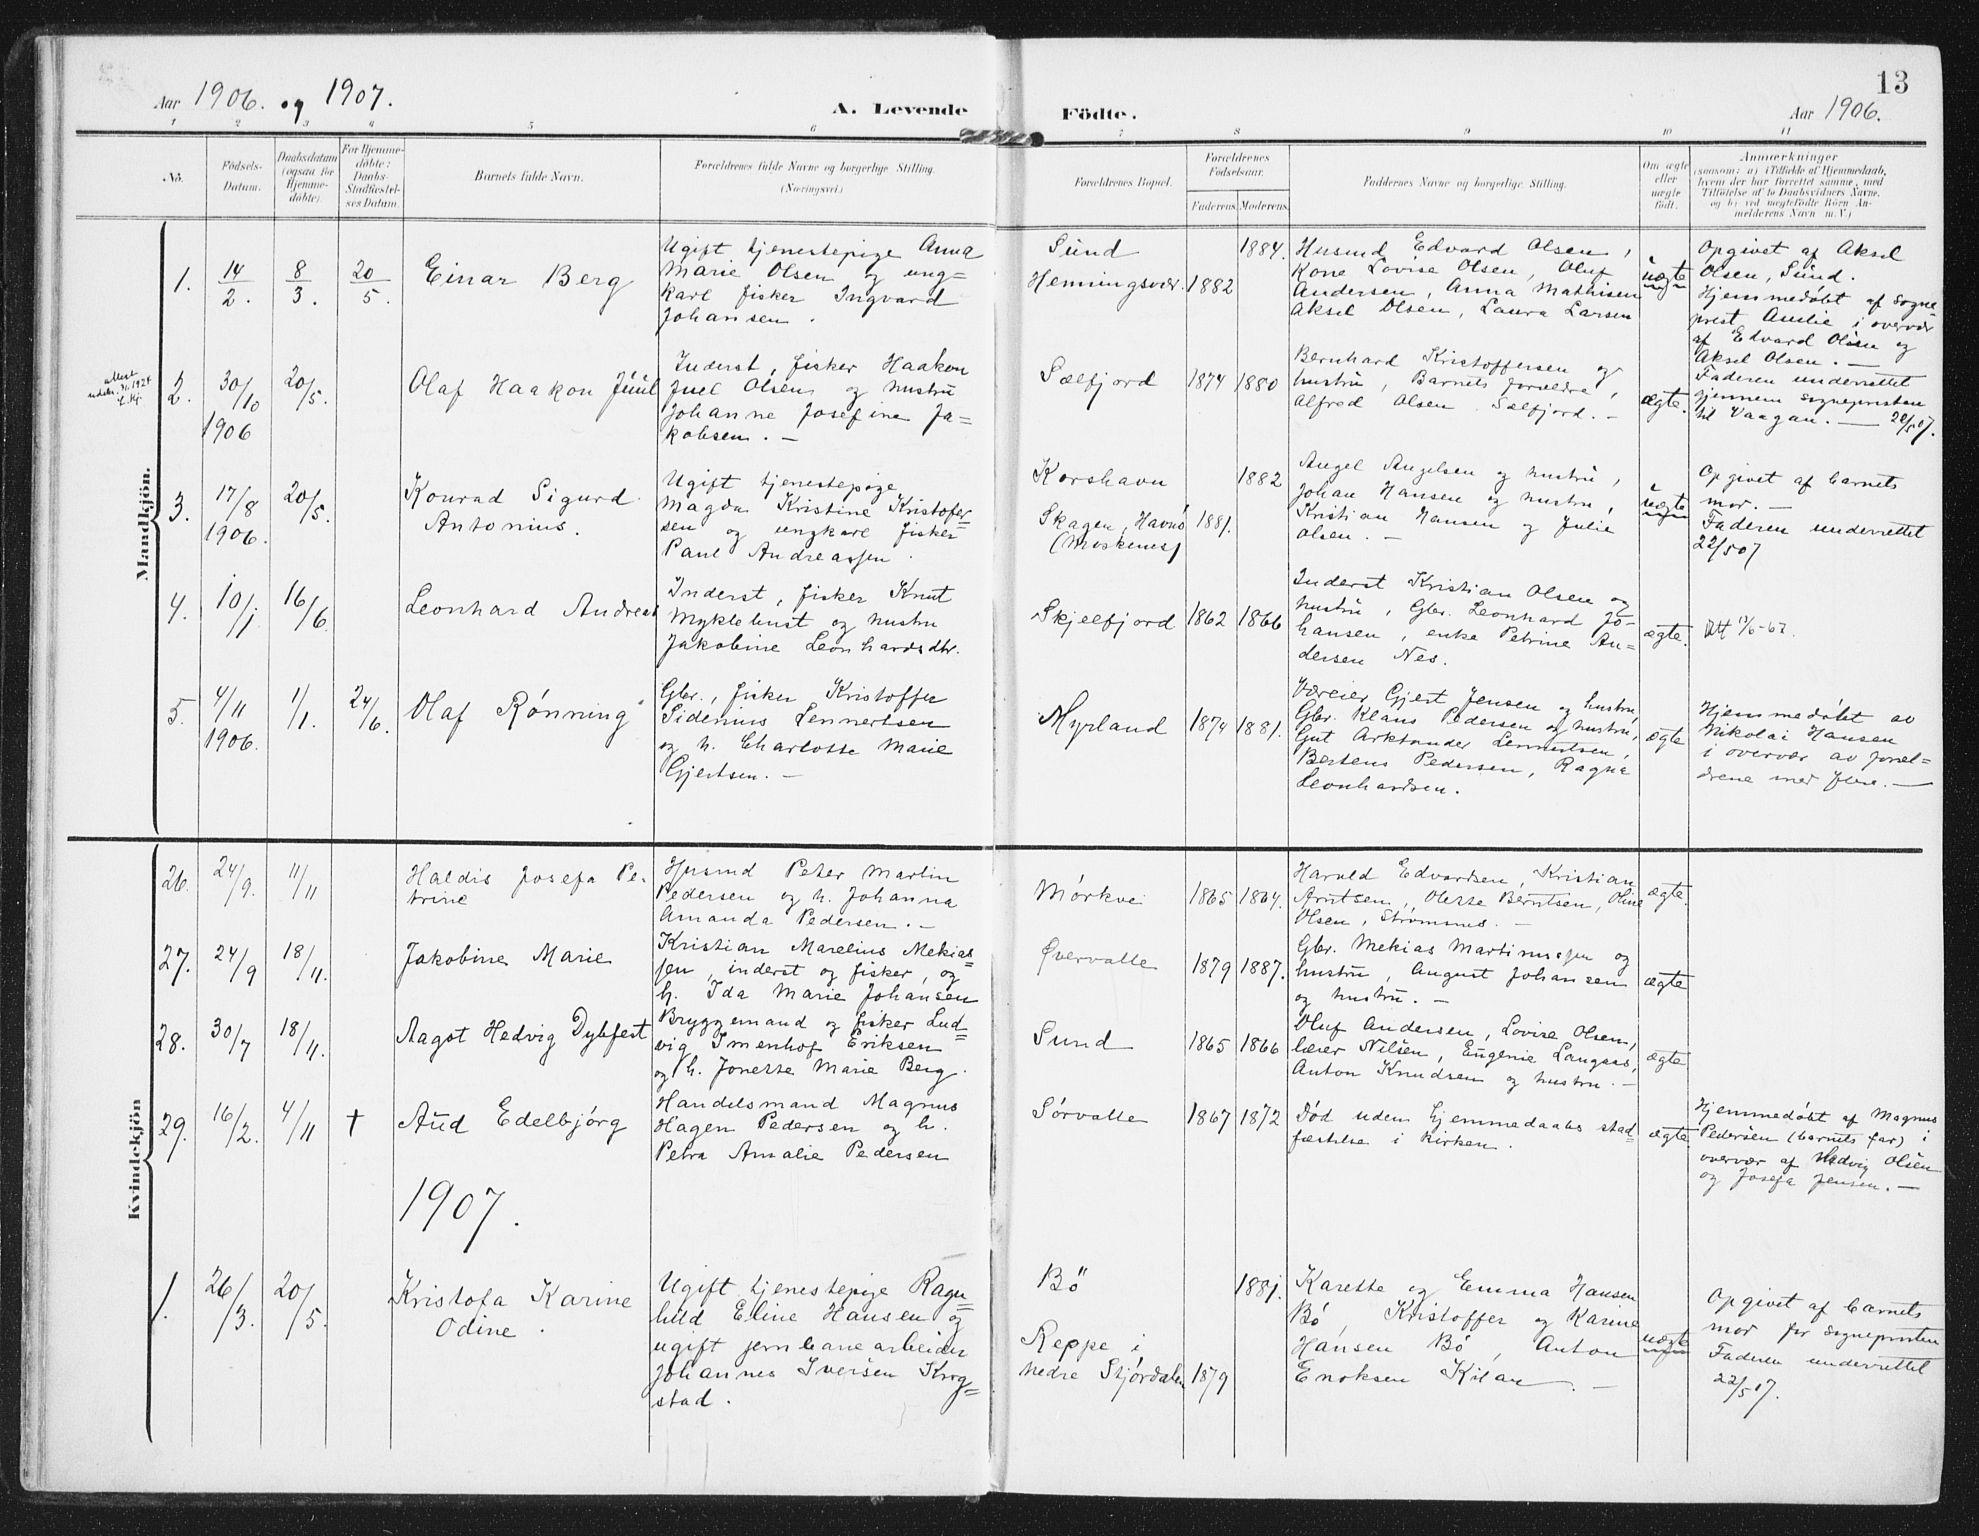 SAT, Ministerialprotokoller, klokkerbøker og fødselsregistre - Nordland, 885/L1206: Ministerialbok nr. 885A07, 1905-1915, s. 13